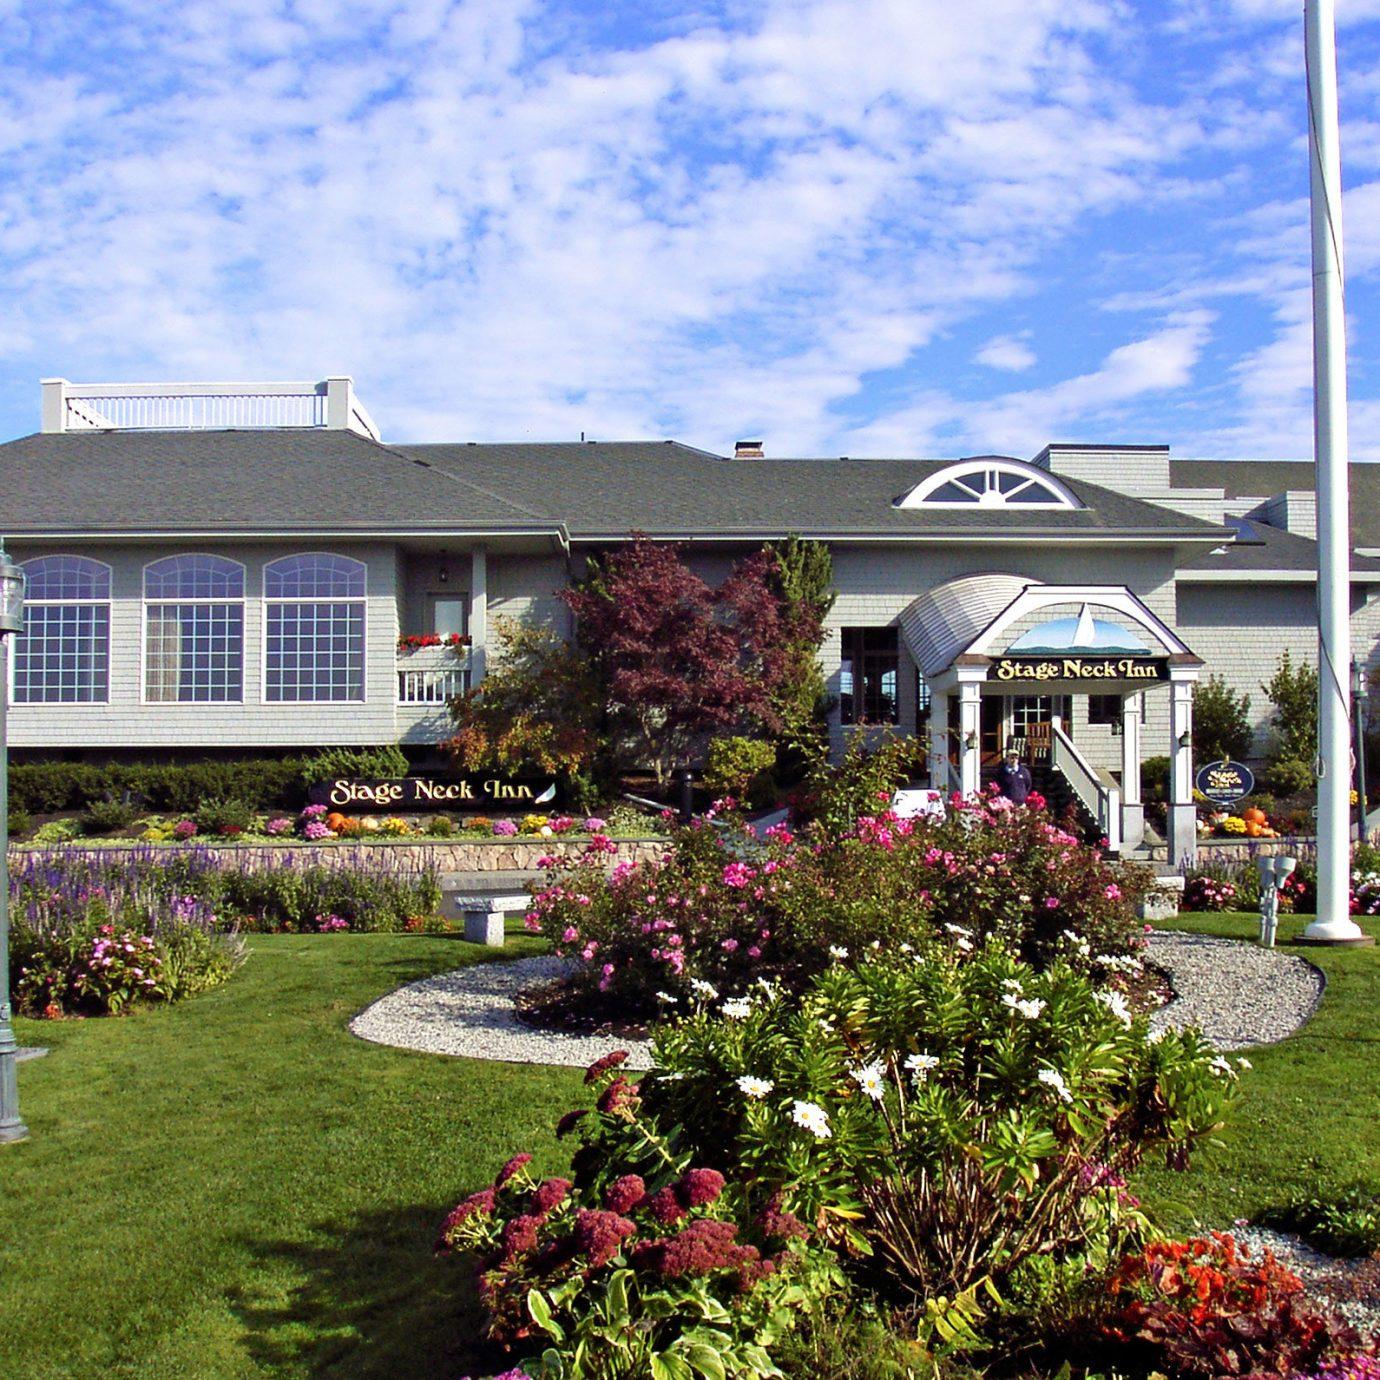 Exterior Inn grass sky building flower house property residential area home Garden yard backyard lawn suburb Resort cottage sign